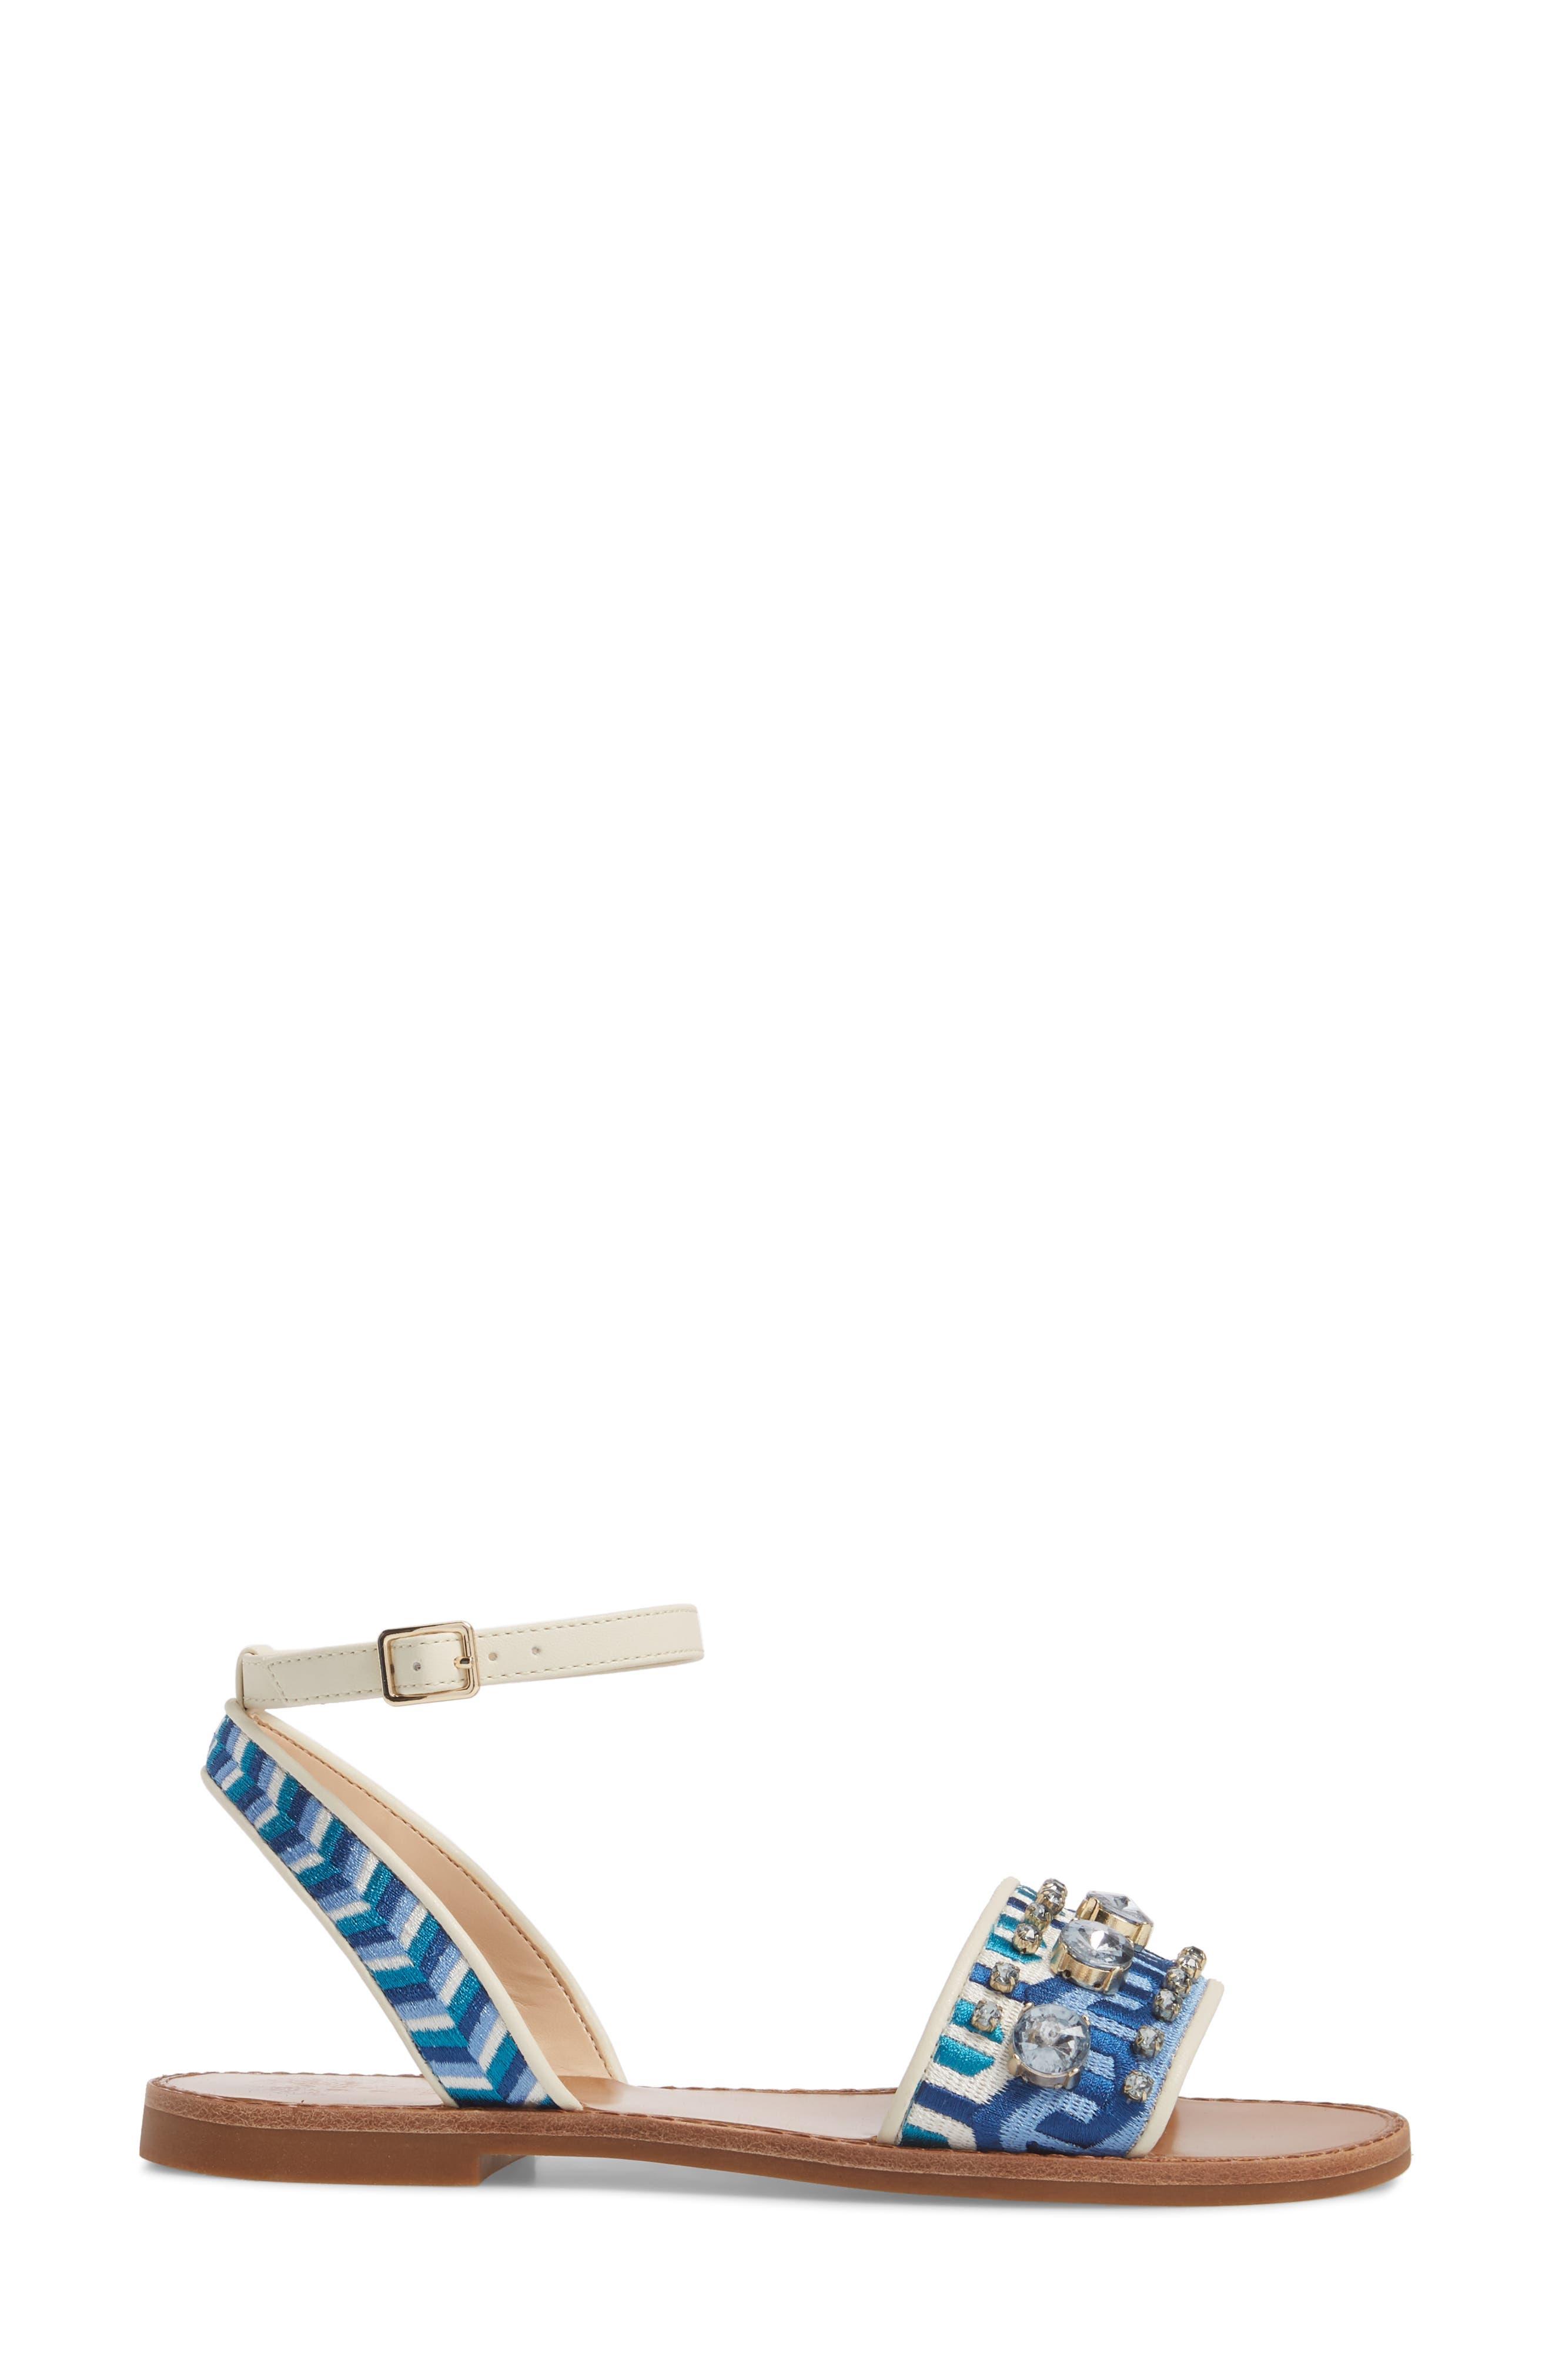 Akitta Sandal,                             Alternate thumbnail 3, color,                             Blue Multi/ Vanilla Fabric